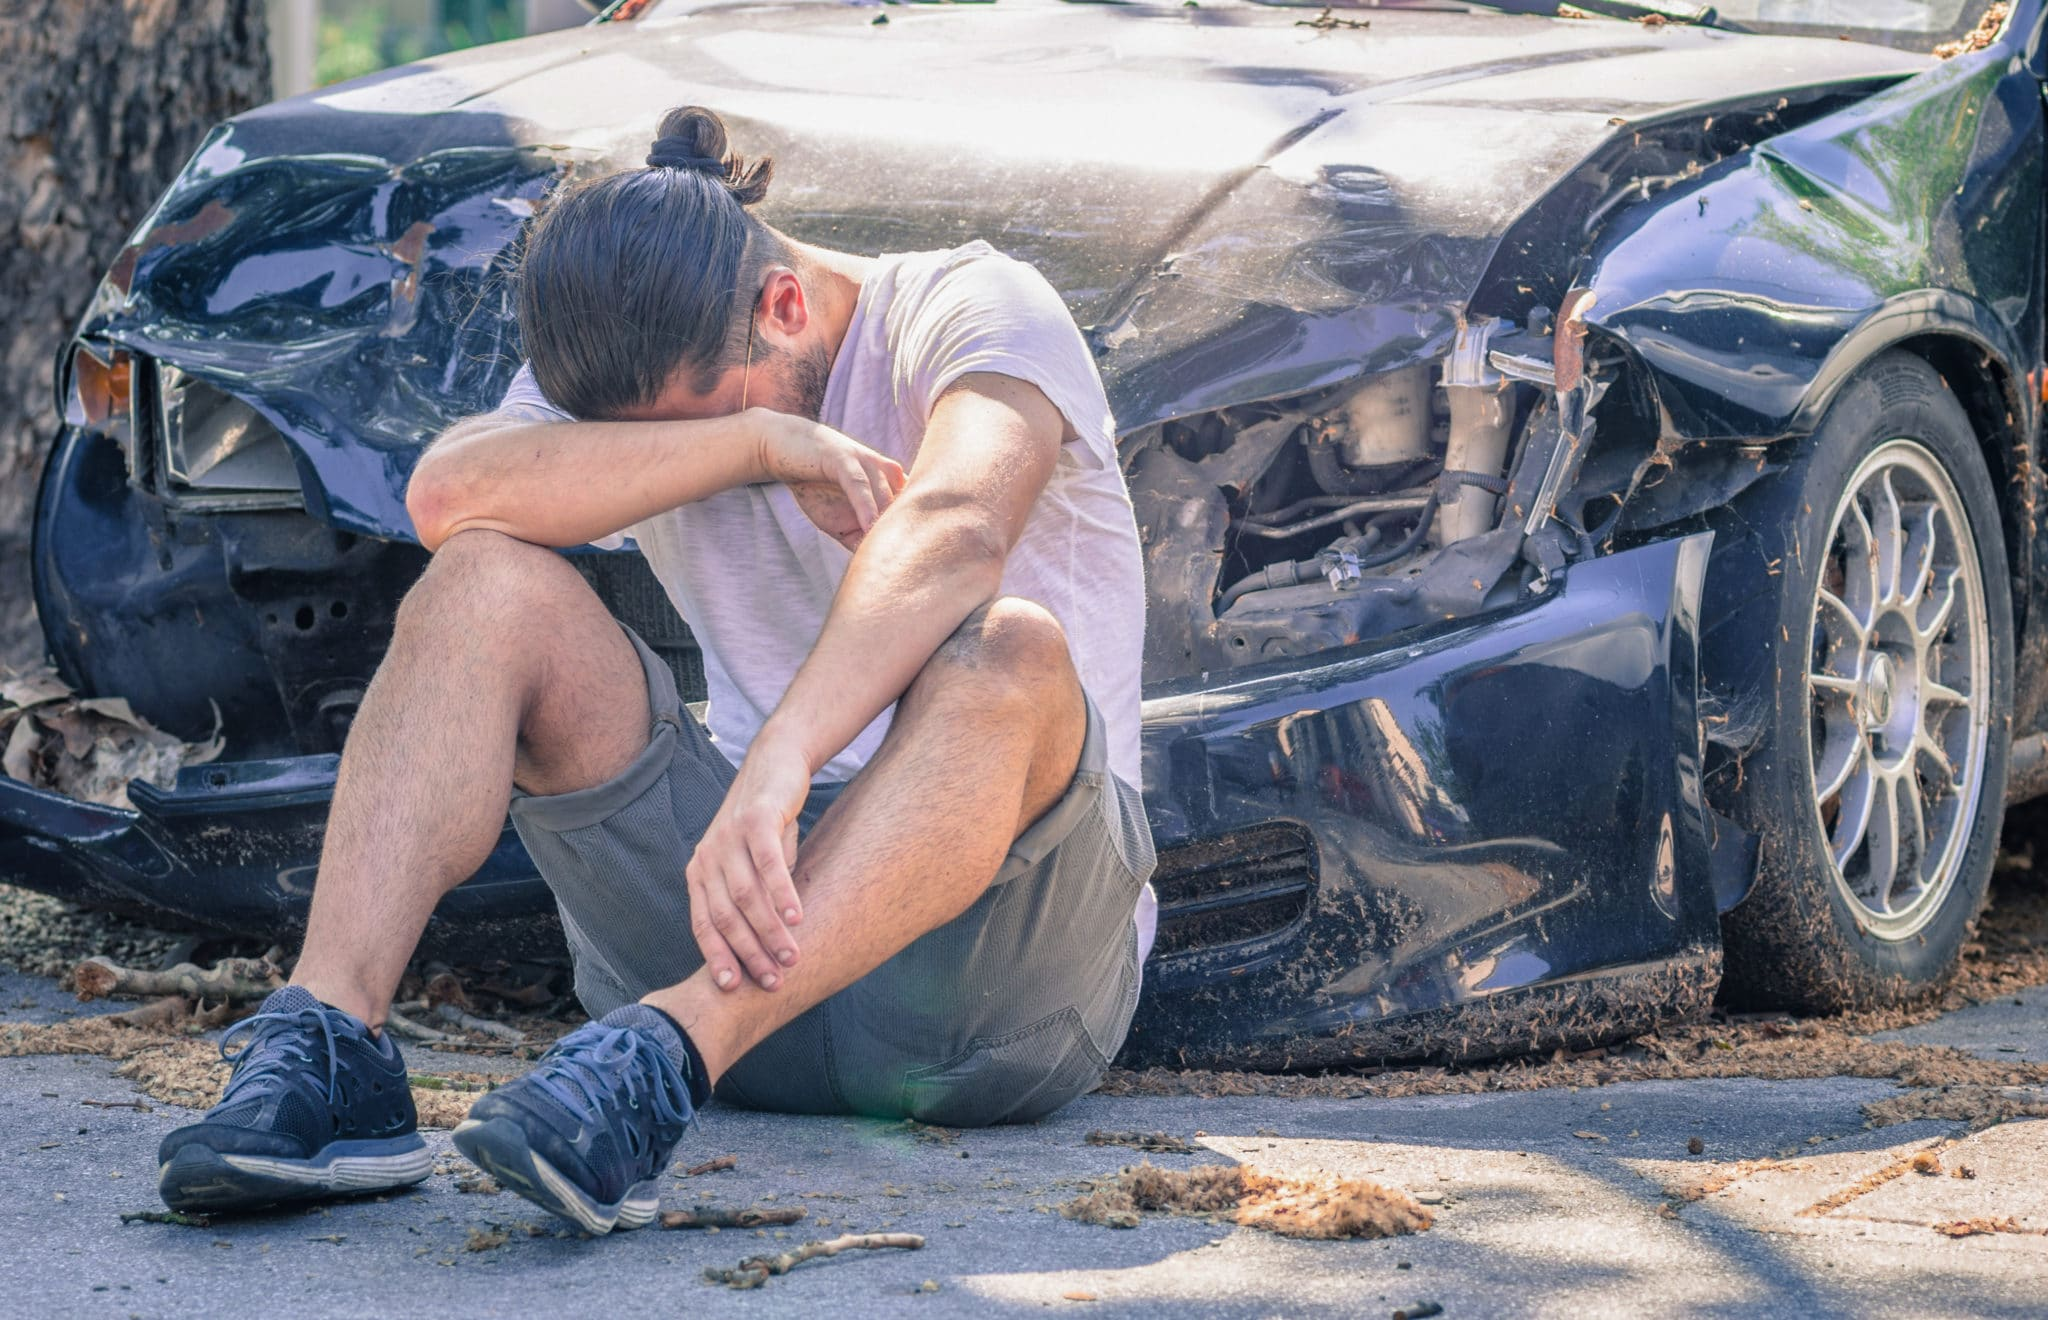 Fachanwalt für Verkehrsrecht Unfall